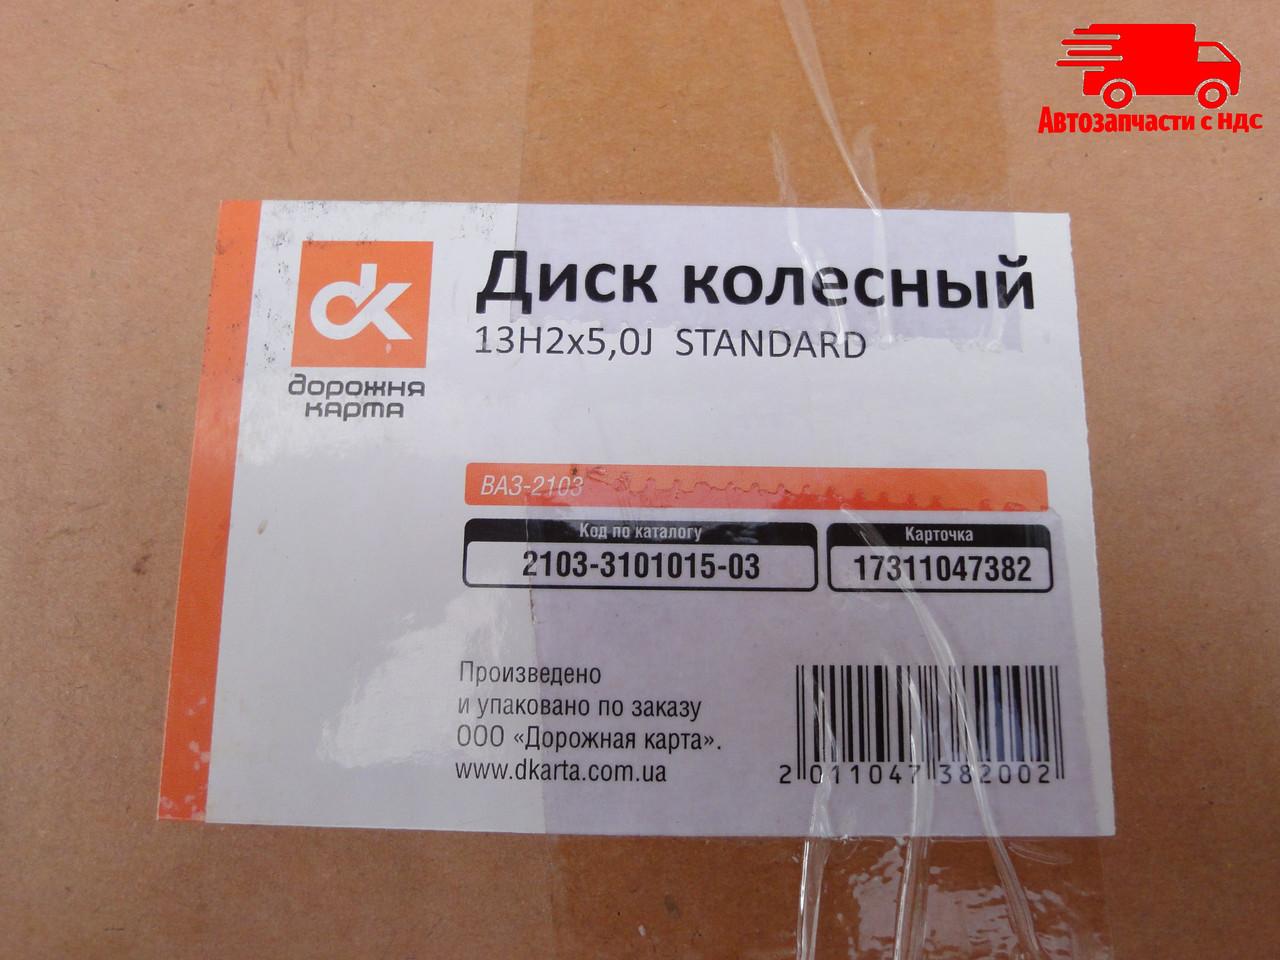 1982504832_w640_h640_disk-kolesnyj-13n2h